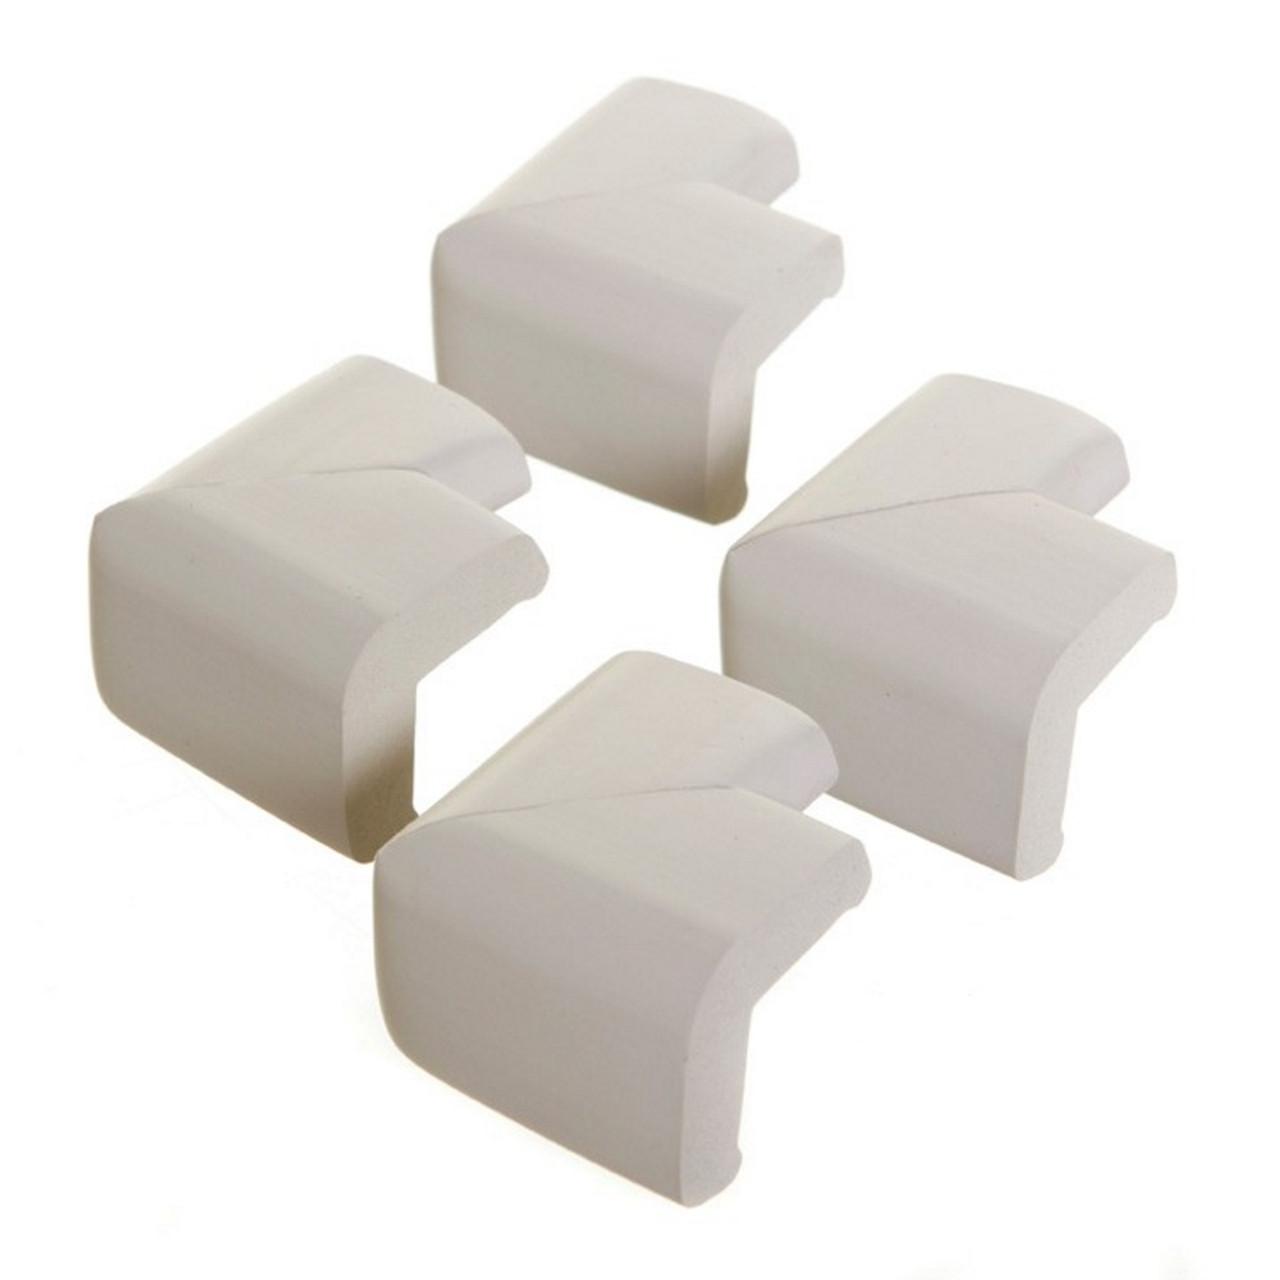 Dreambaby Foam Corner Bumper 4 Pieces